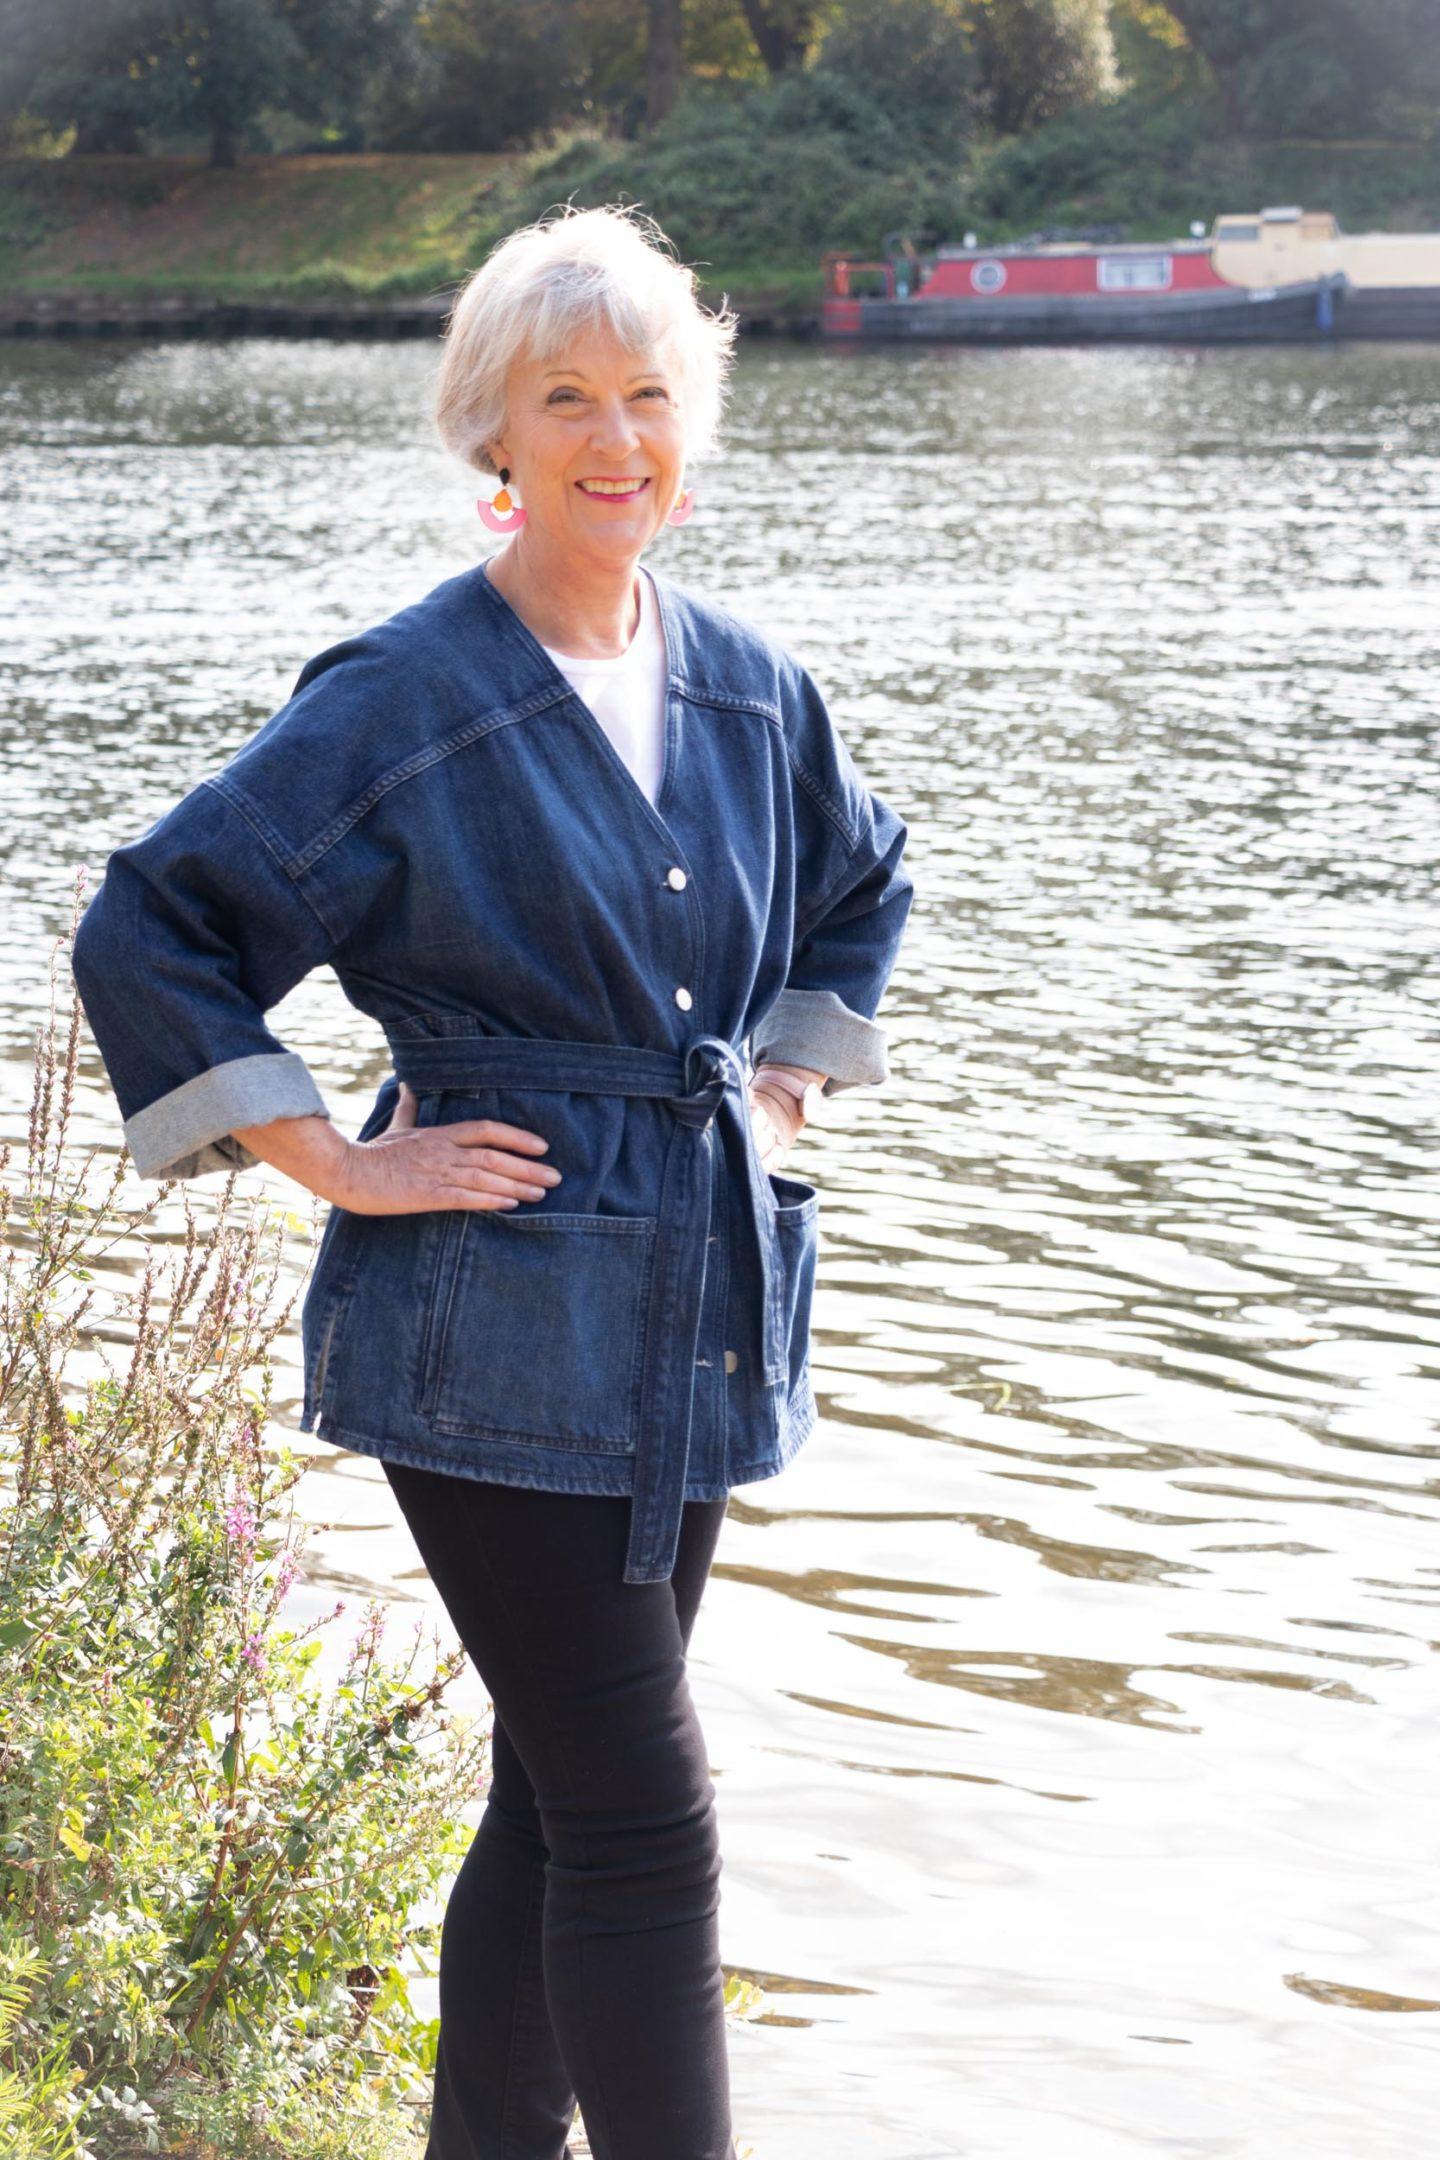 Denim jacket for women over 50